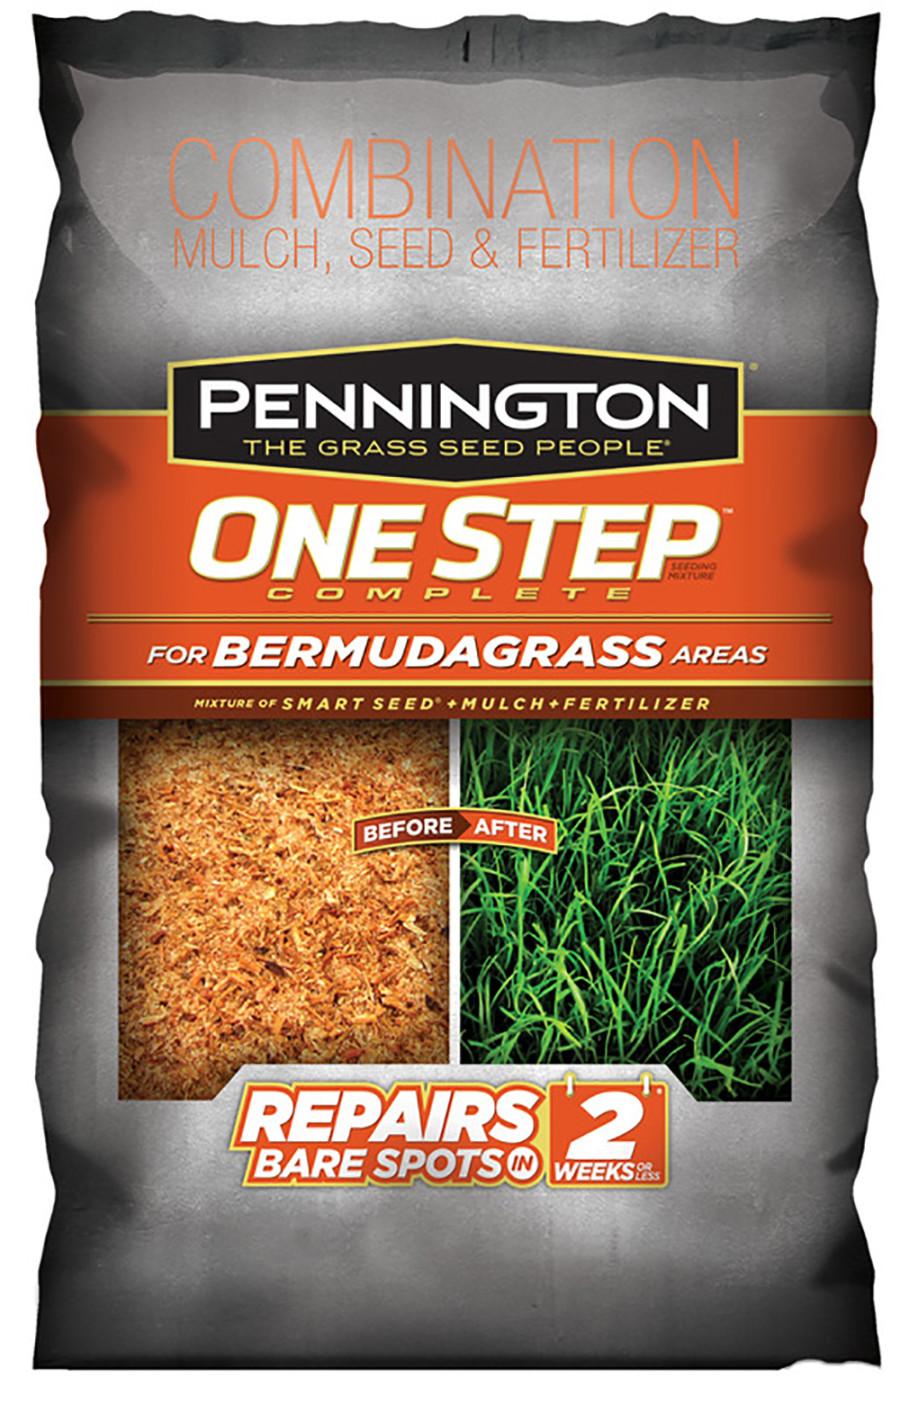 Pennington One Step Complete Bermudagrass Seed, Mulch, Fertilizer Premium Seed 36ea/8.3 lb